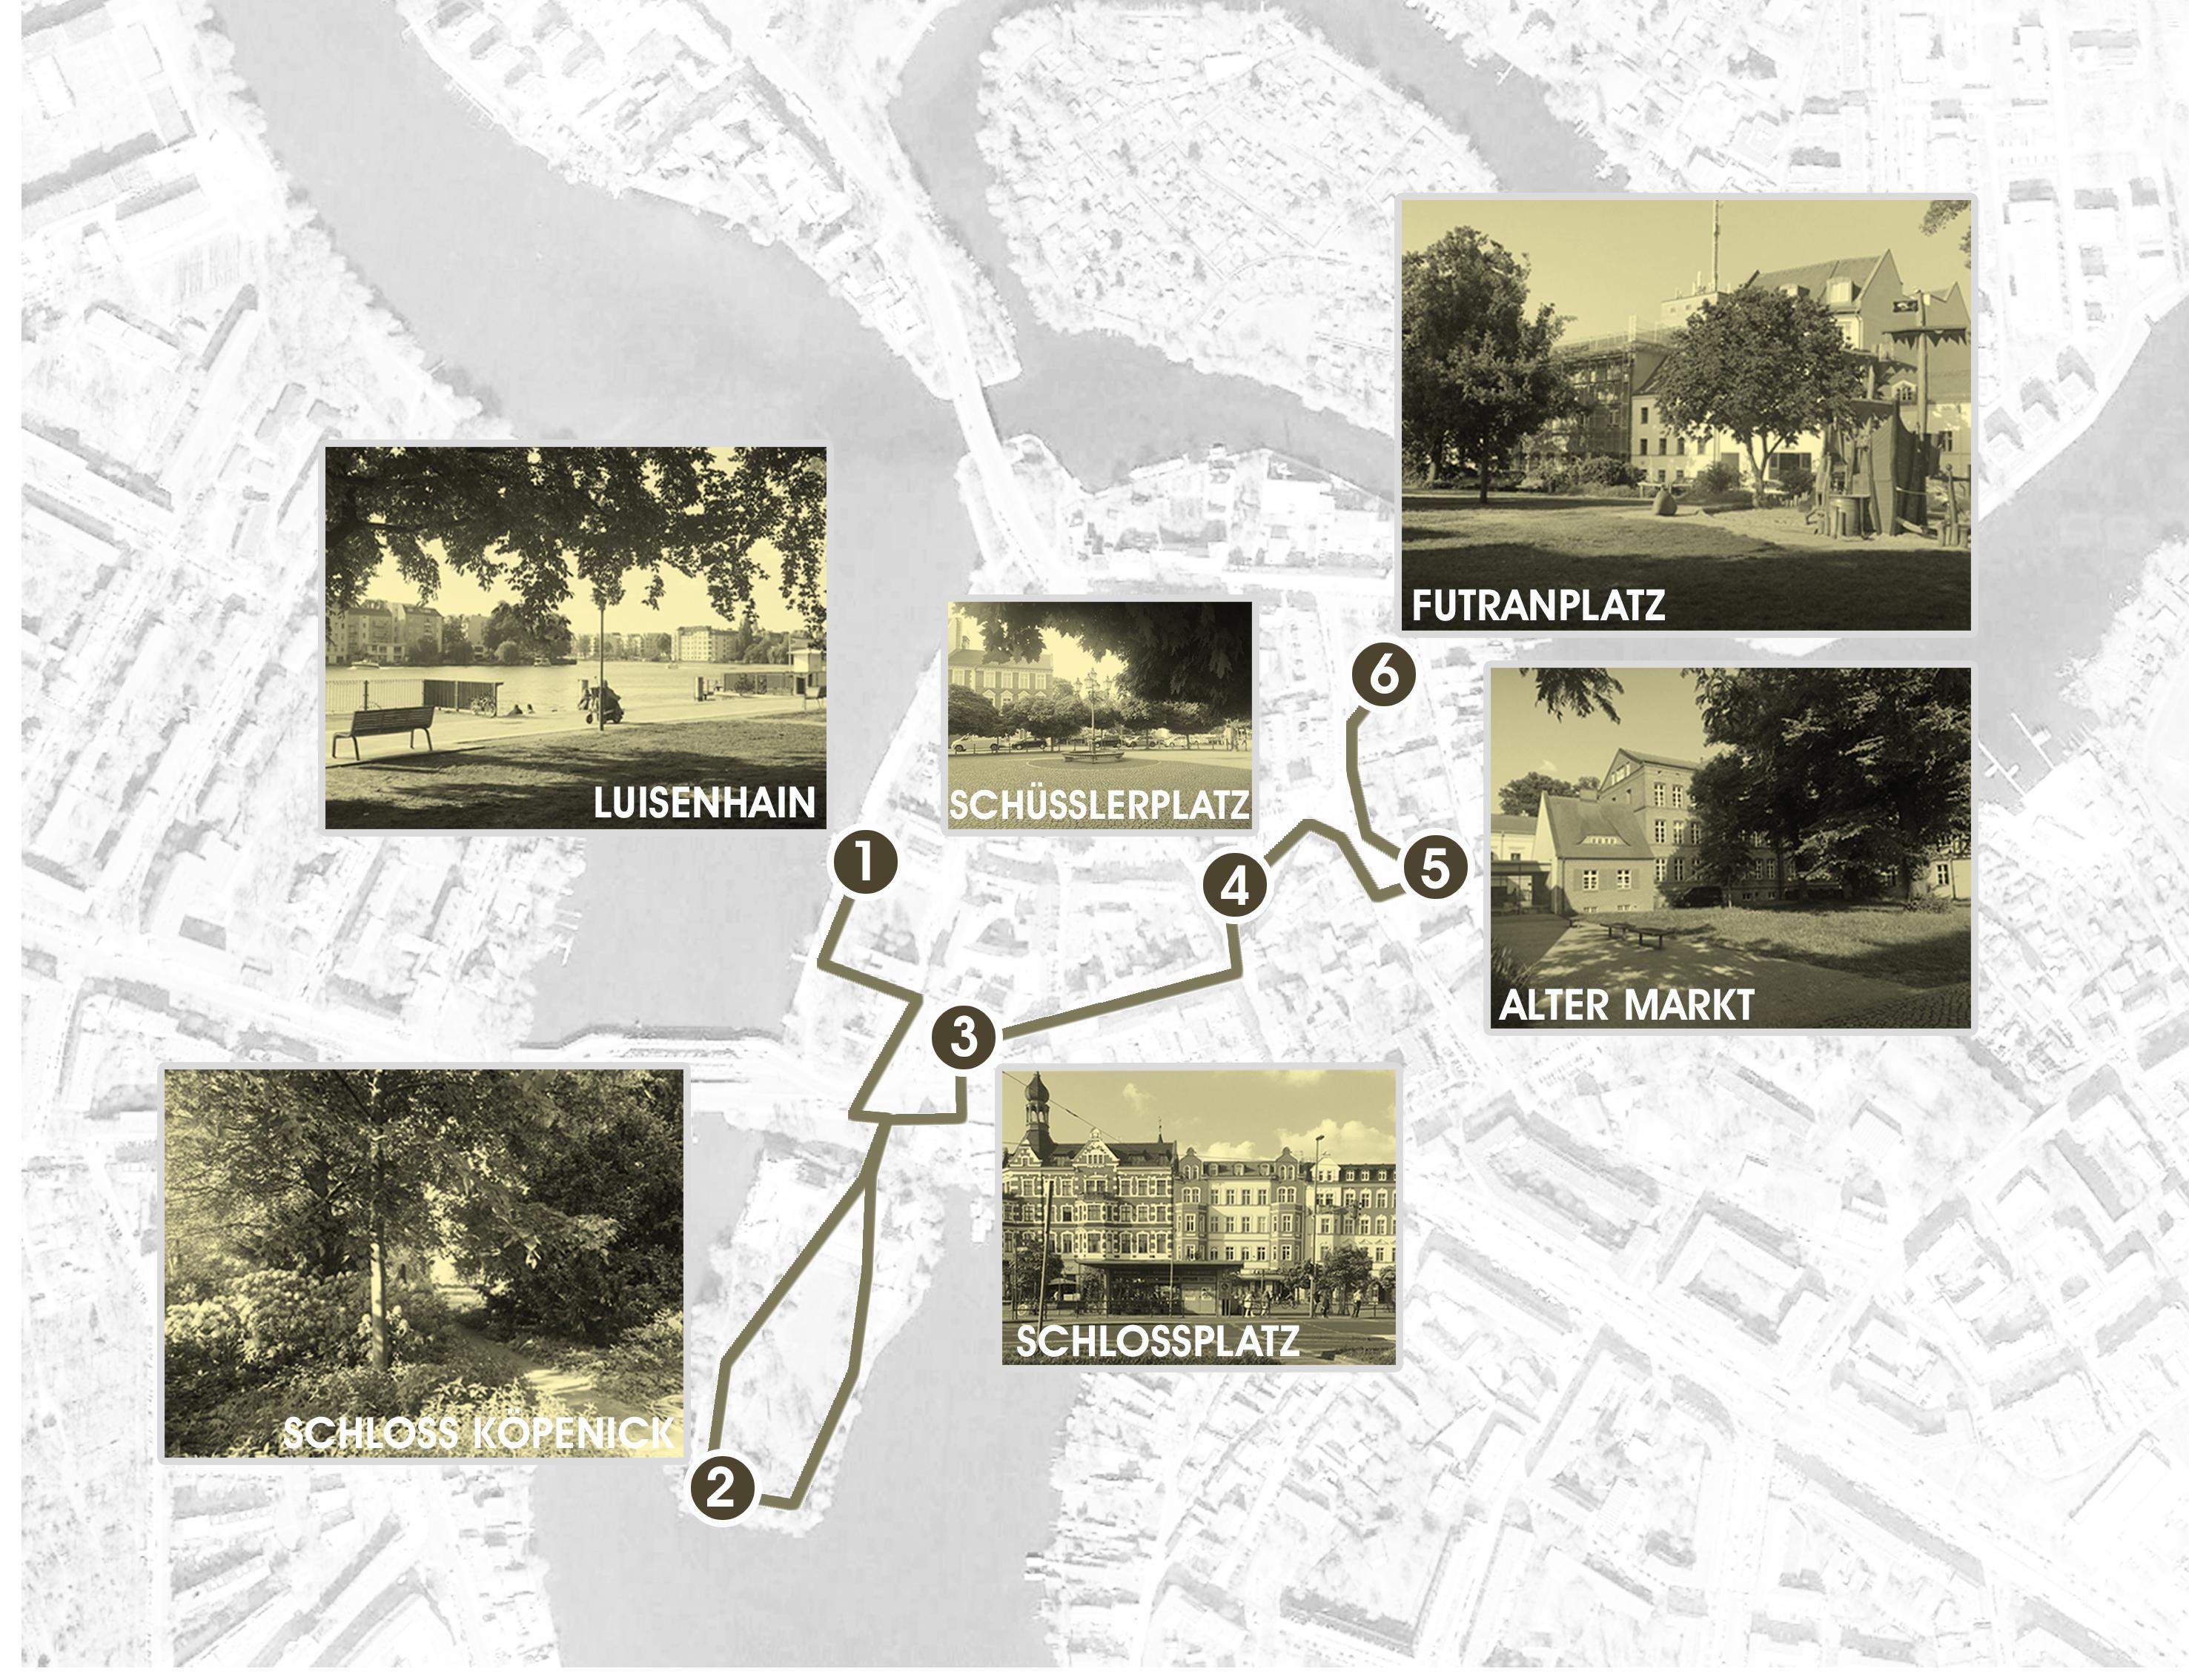 soundwalk-map